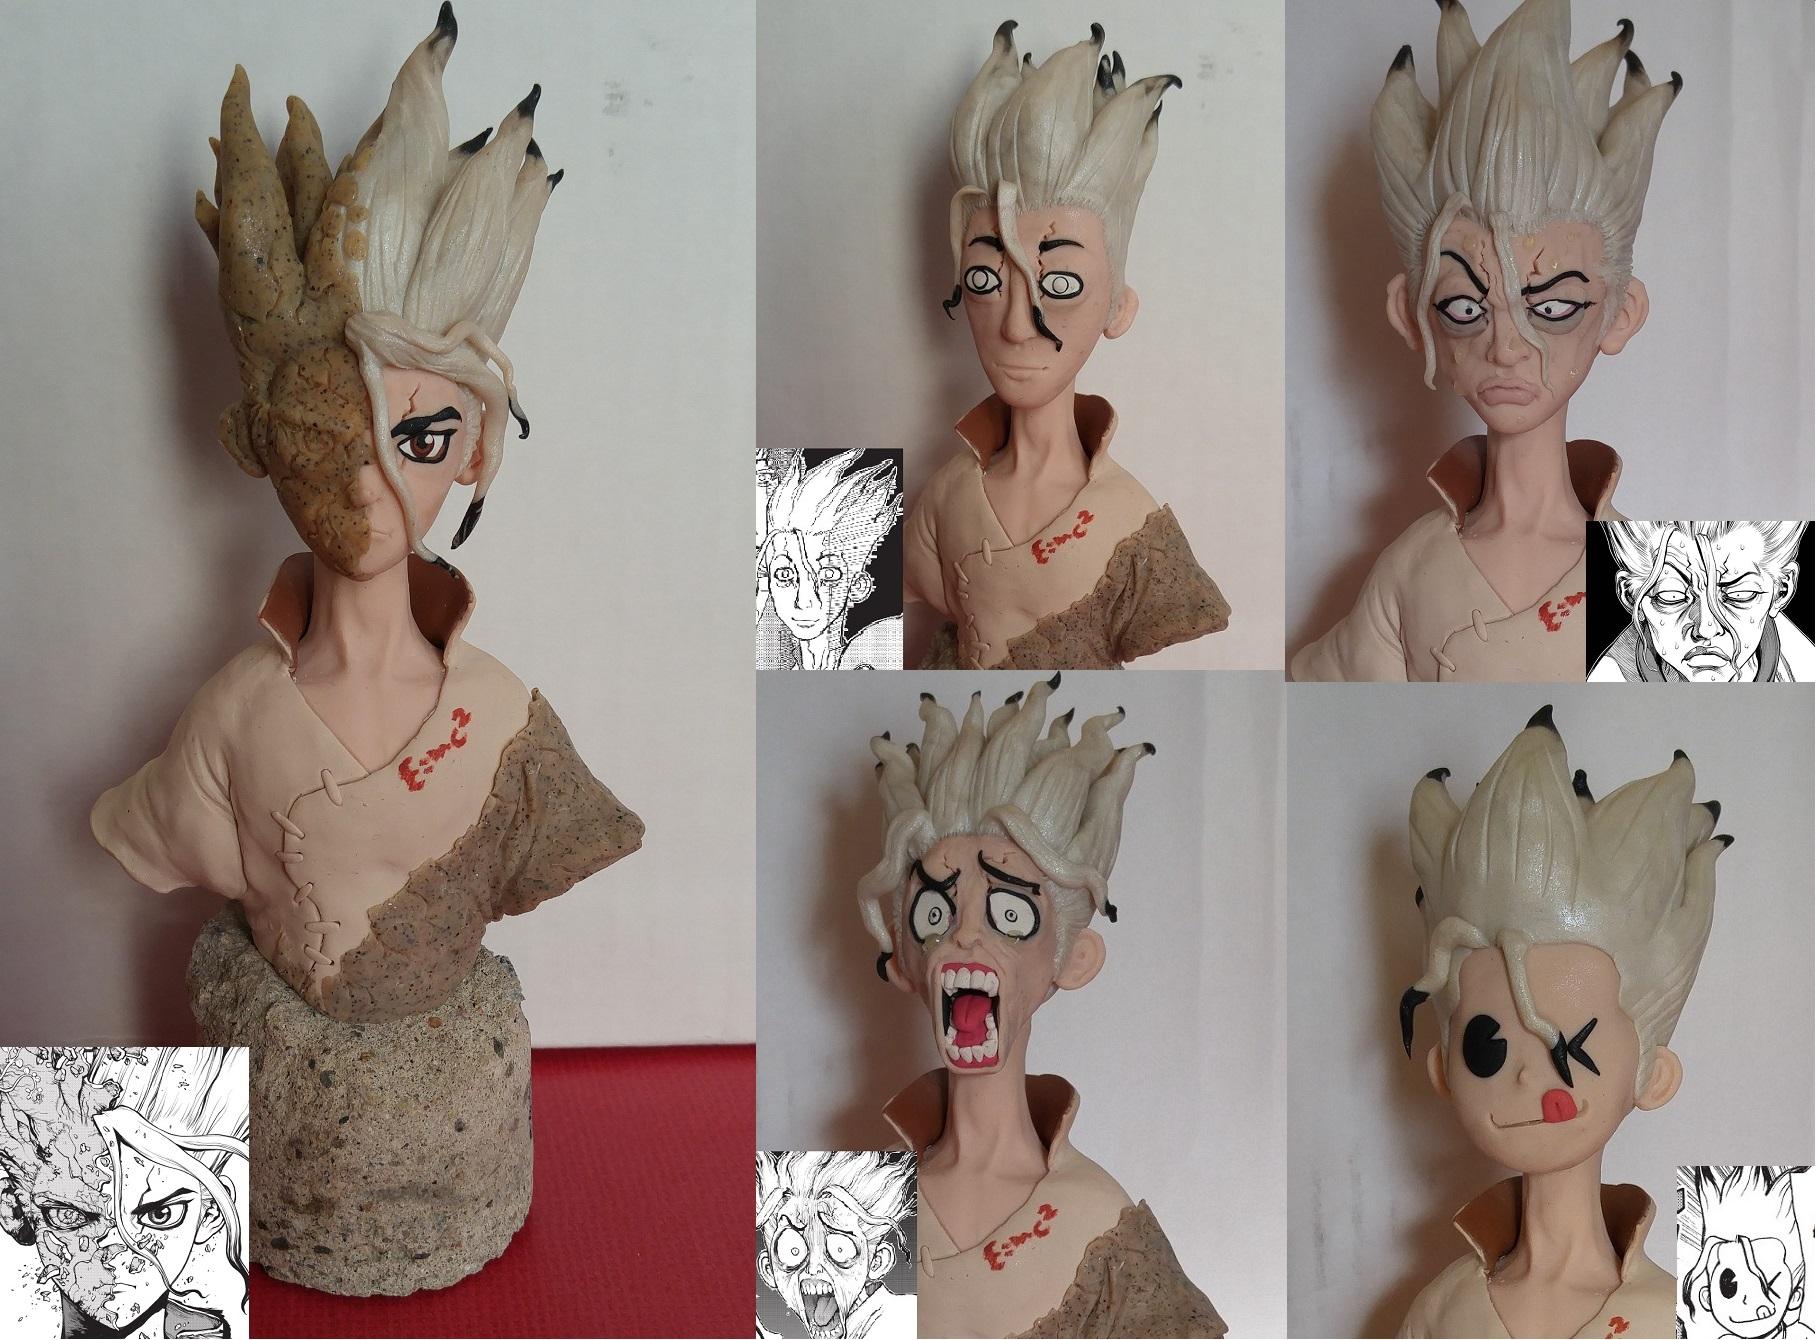 Faces of Senku (Dr. Stone)